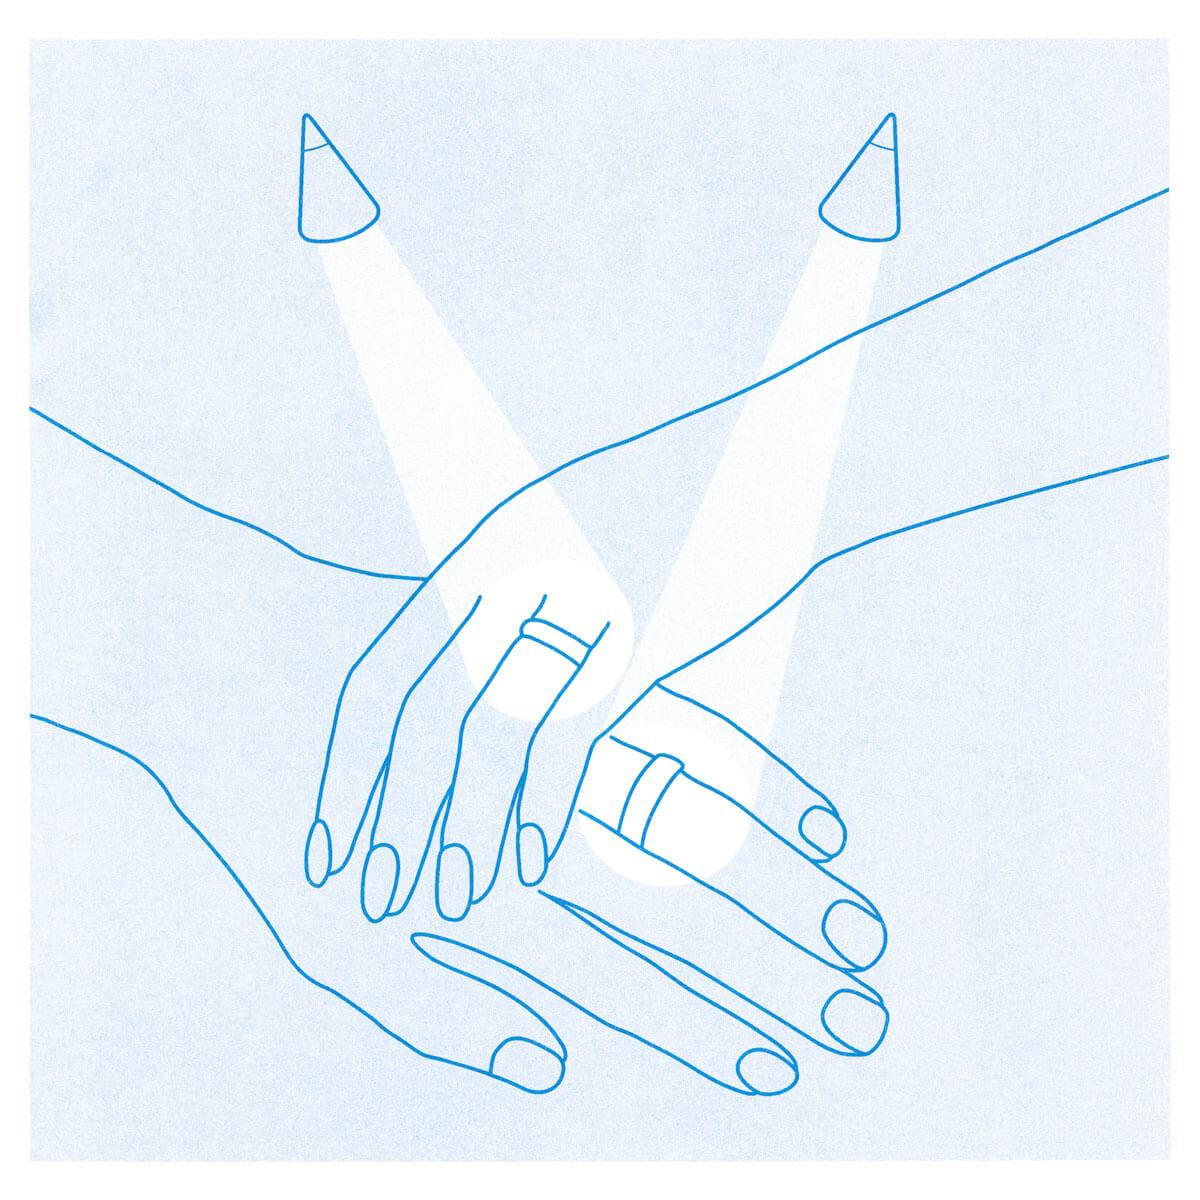 studio-malagon-love-optimized-inventions-ring-finger-spotlight